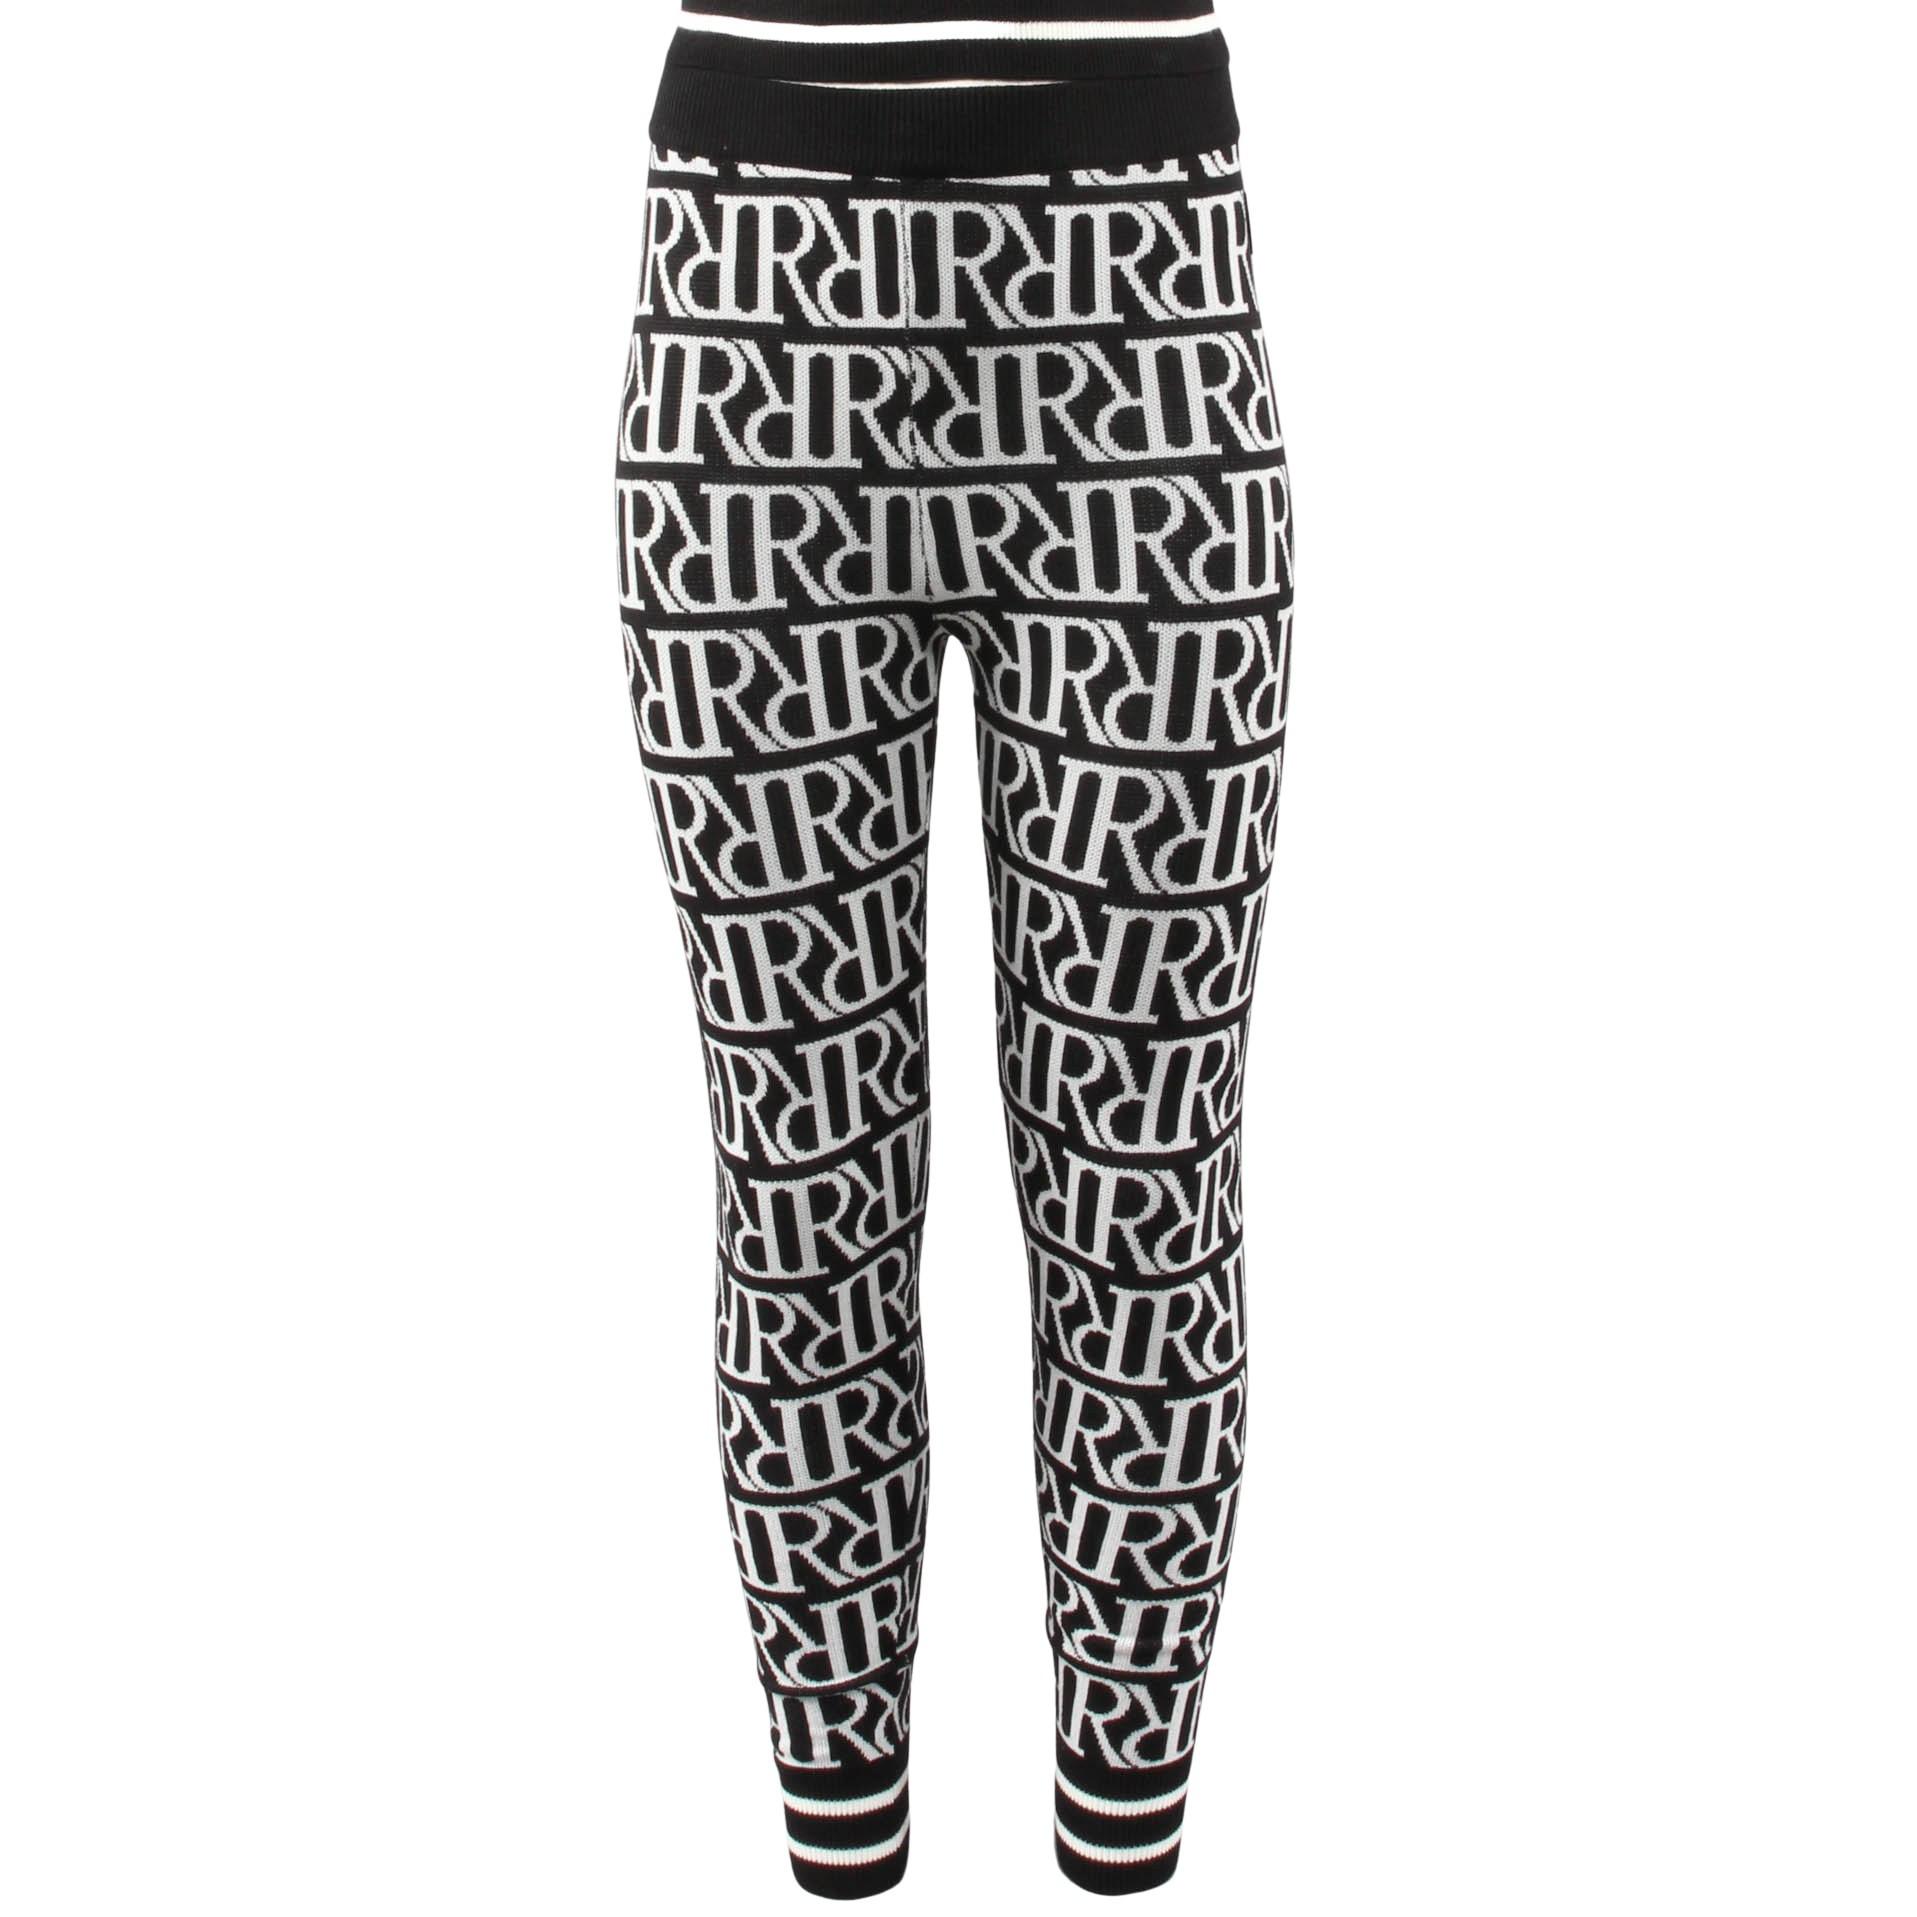 Afbeelding van Reinders Rr print pants zwart